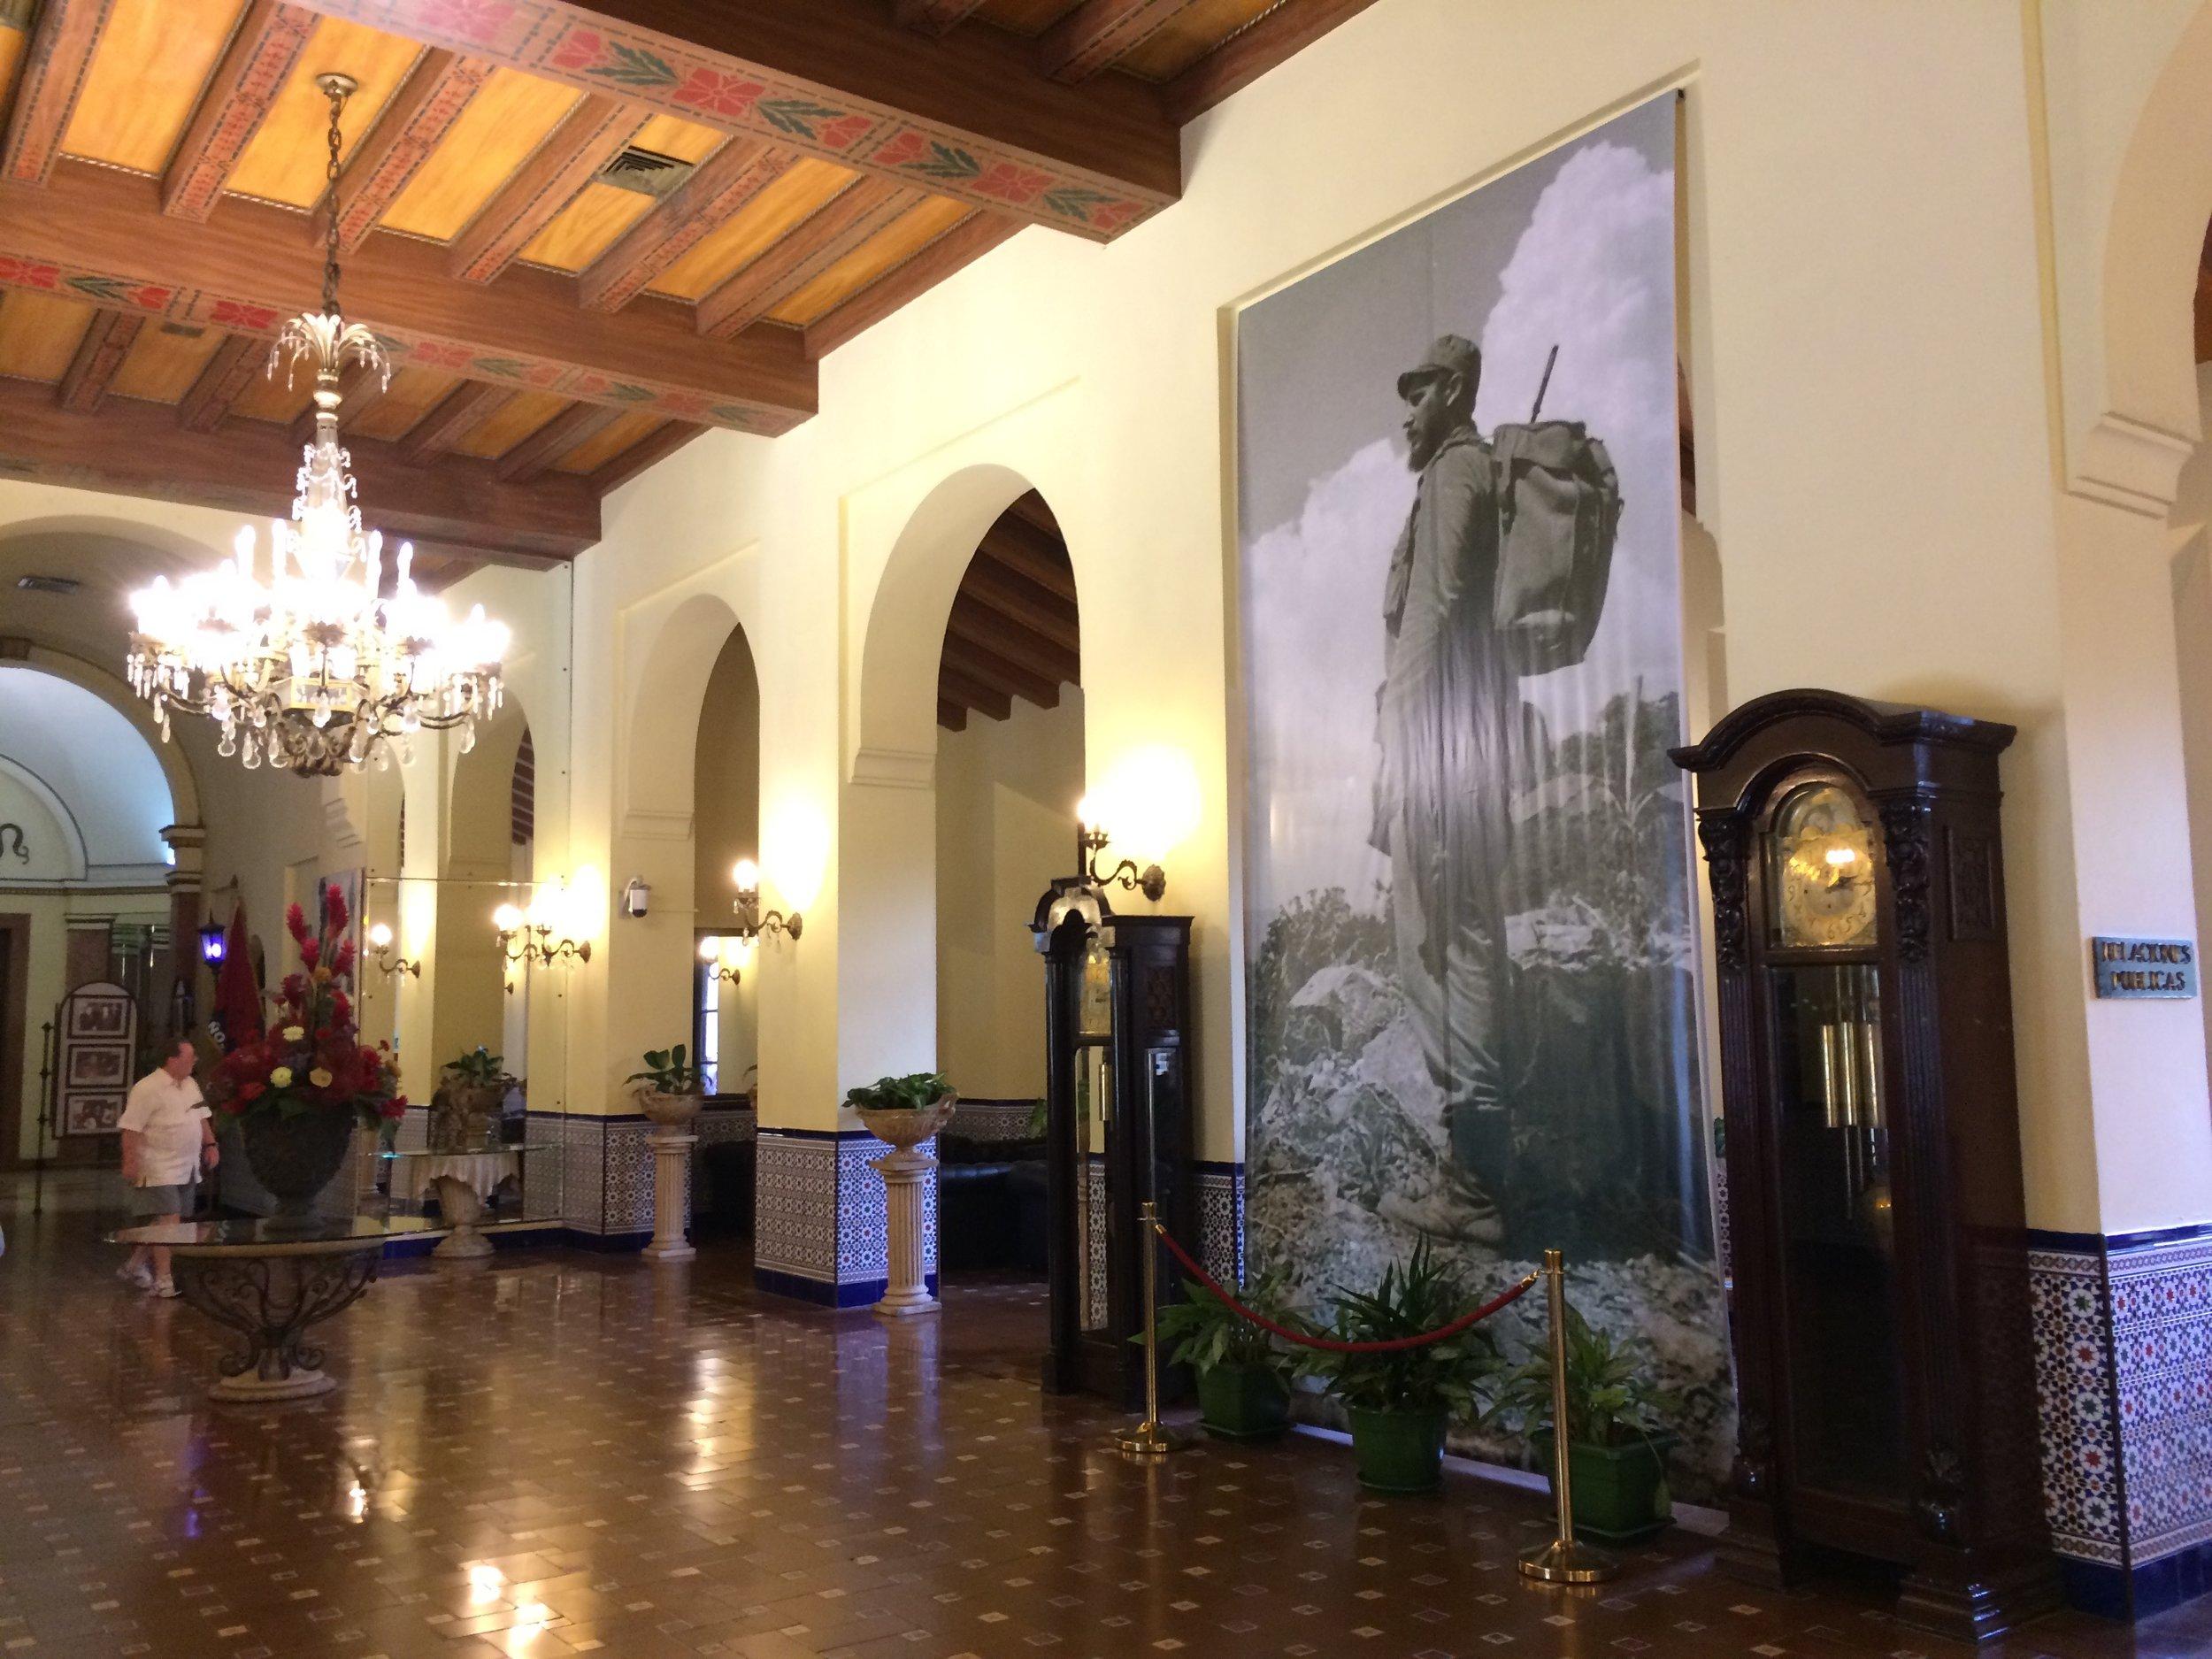 Hotel Nacional lobby